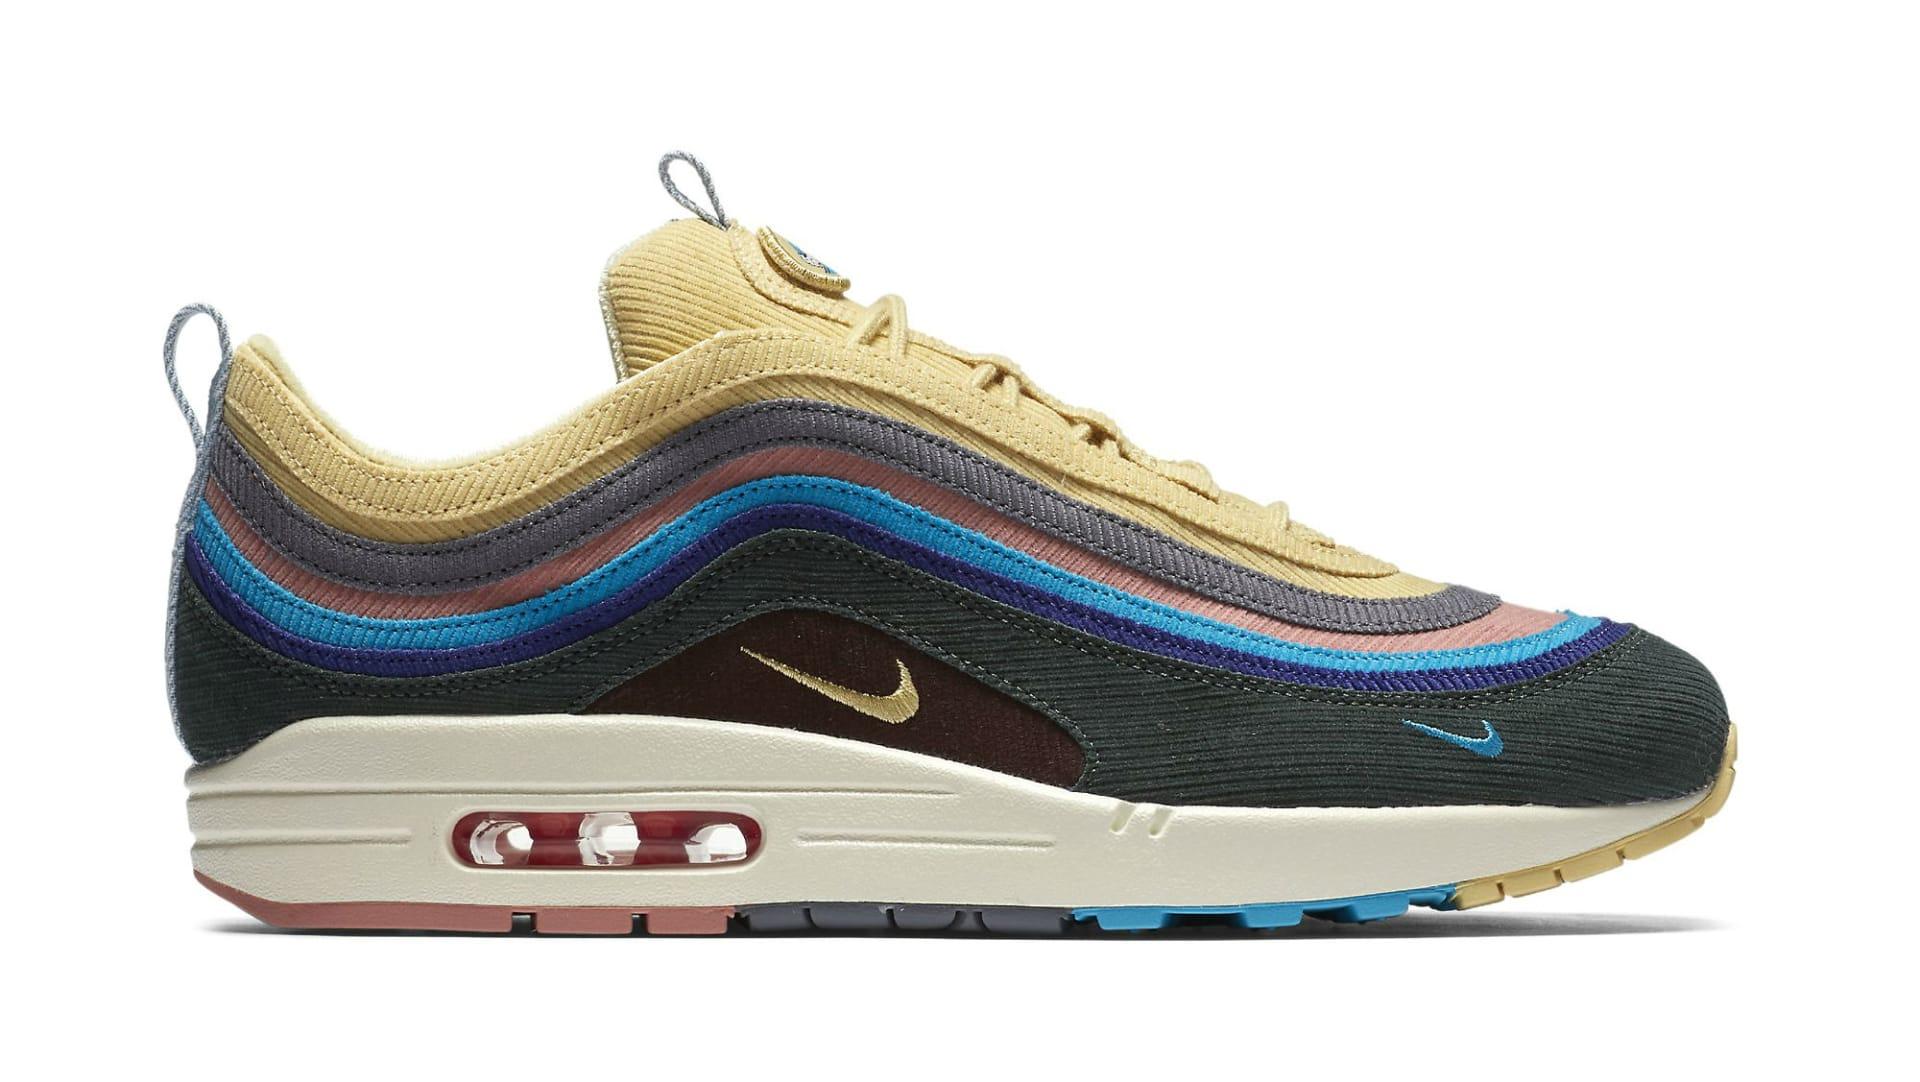 ca88f642711db0 Sean Wotherspoon x Nike Air Max 1 97